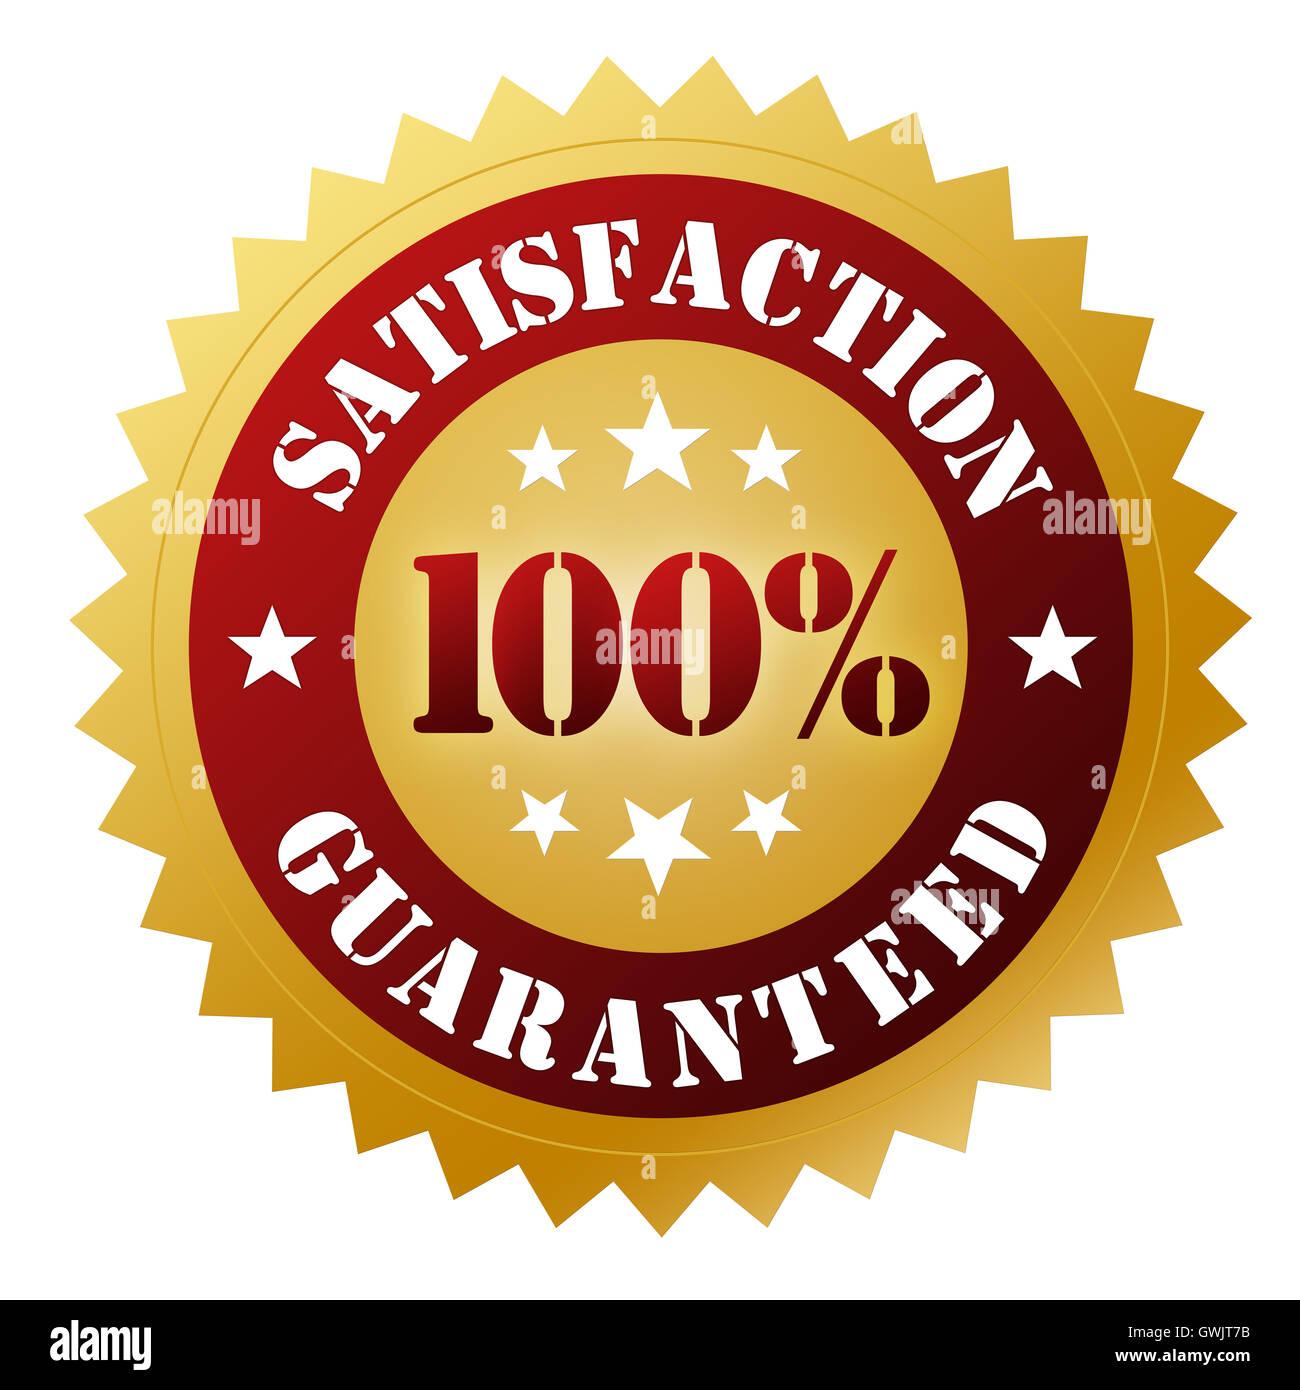 satisfaction guaranteed badge concept  3d illustration - Stock Image